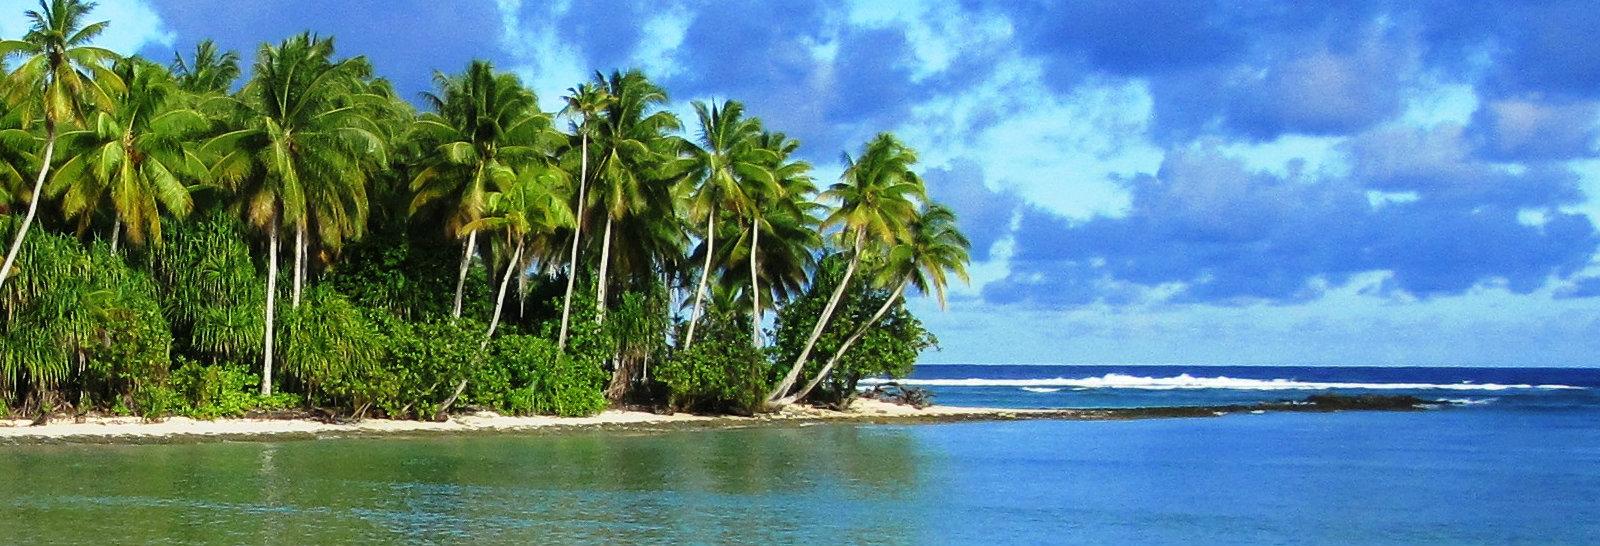 https://i0.wp.com/nomadesdigitais.com/wp-content/uploads/2016/08/Kiribati-Kev-Guy-GRANDE-1.jpg